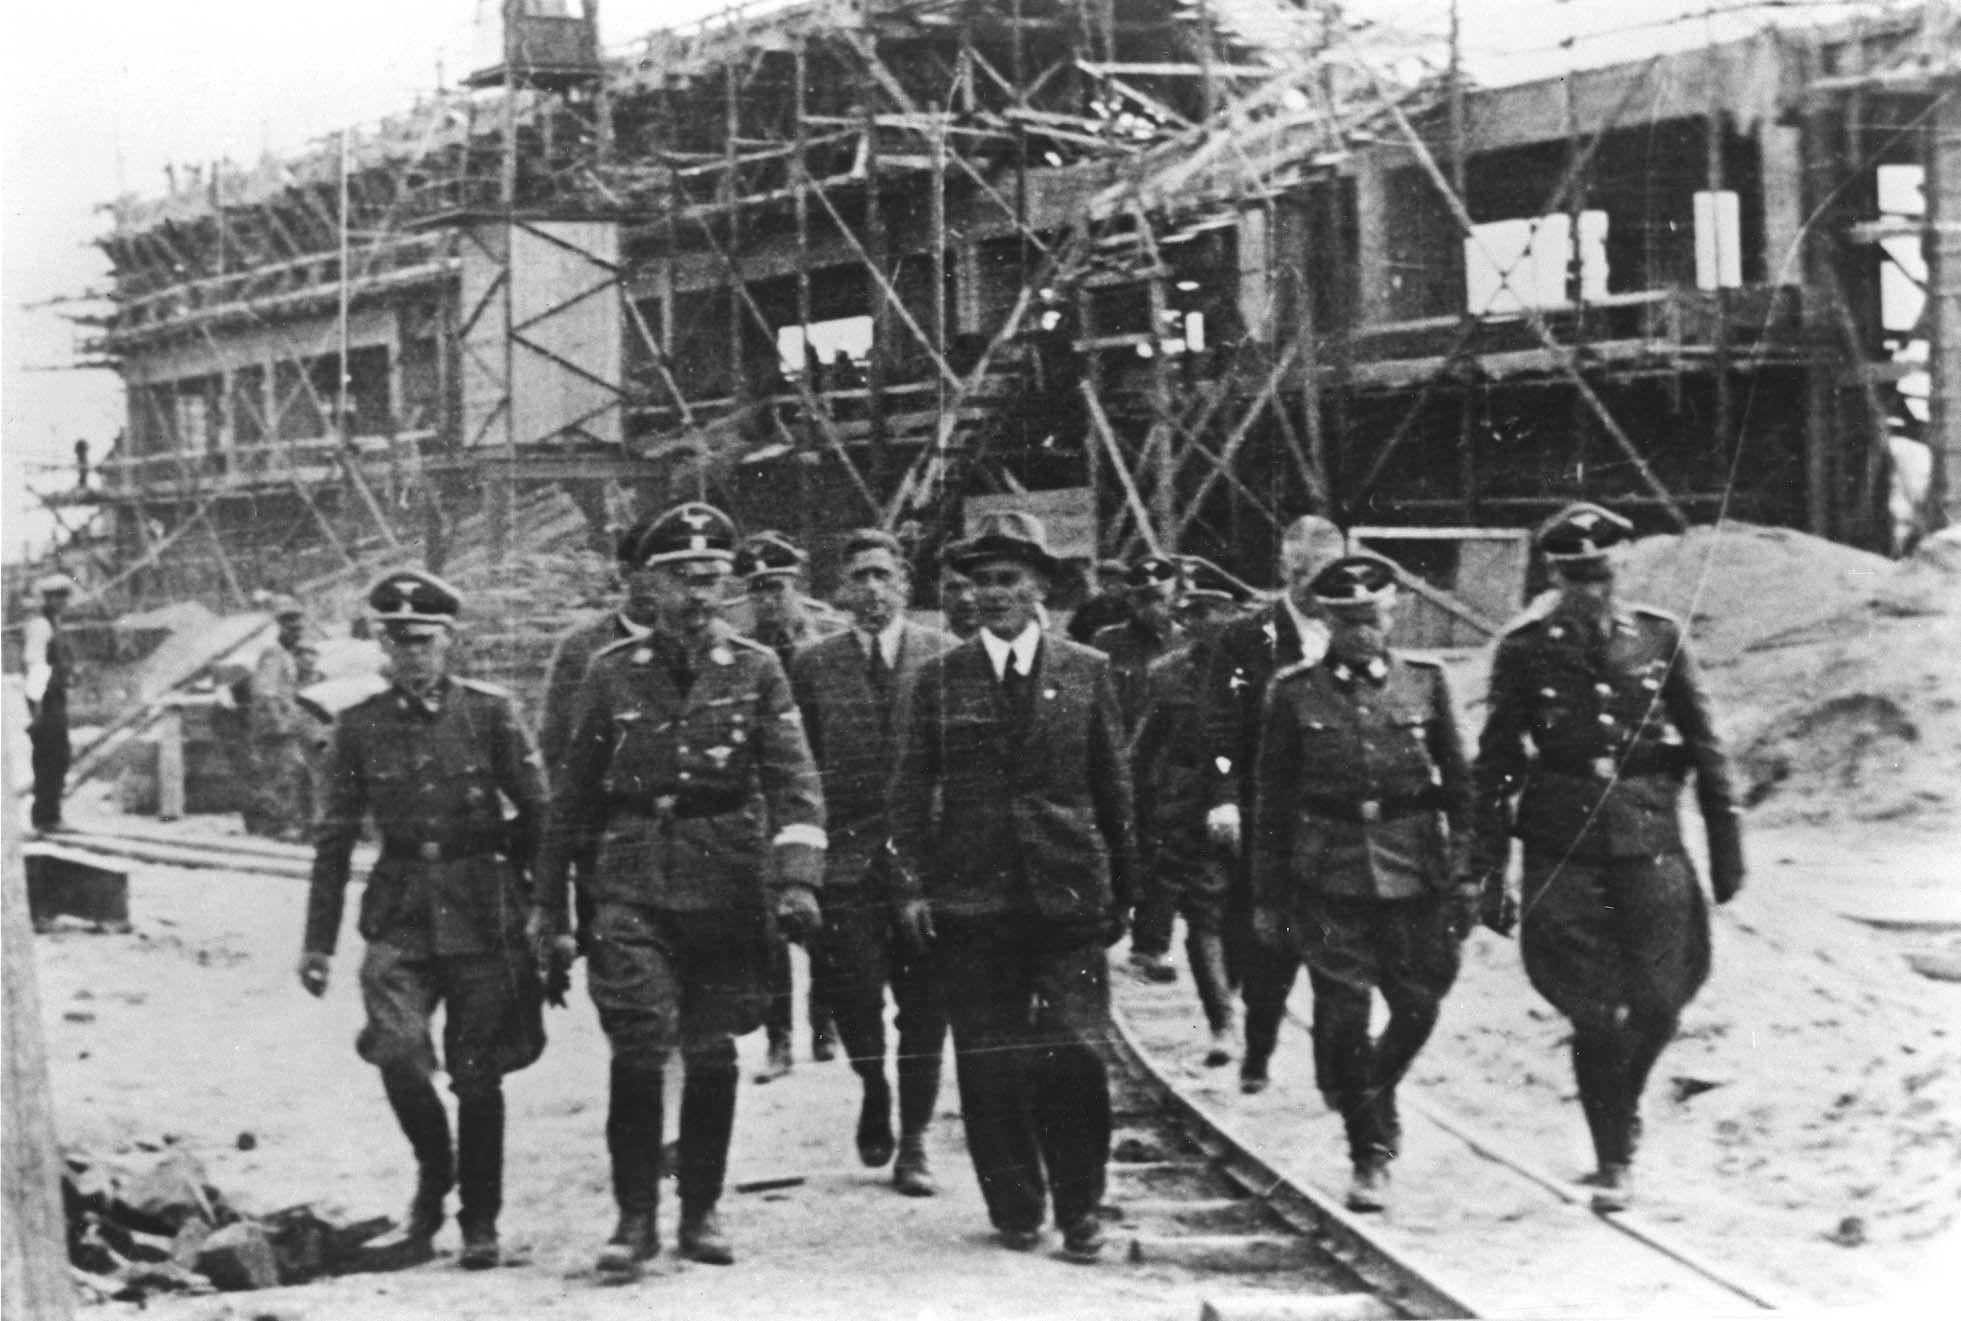 Himmler-I-G-FarbenTrial : The I. G. Farben Case (Nuernberg)